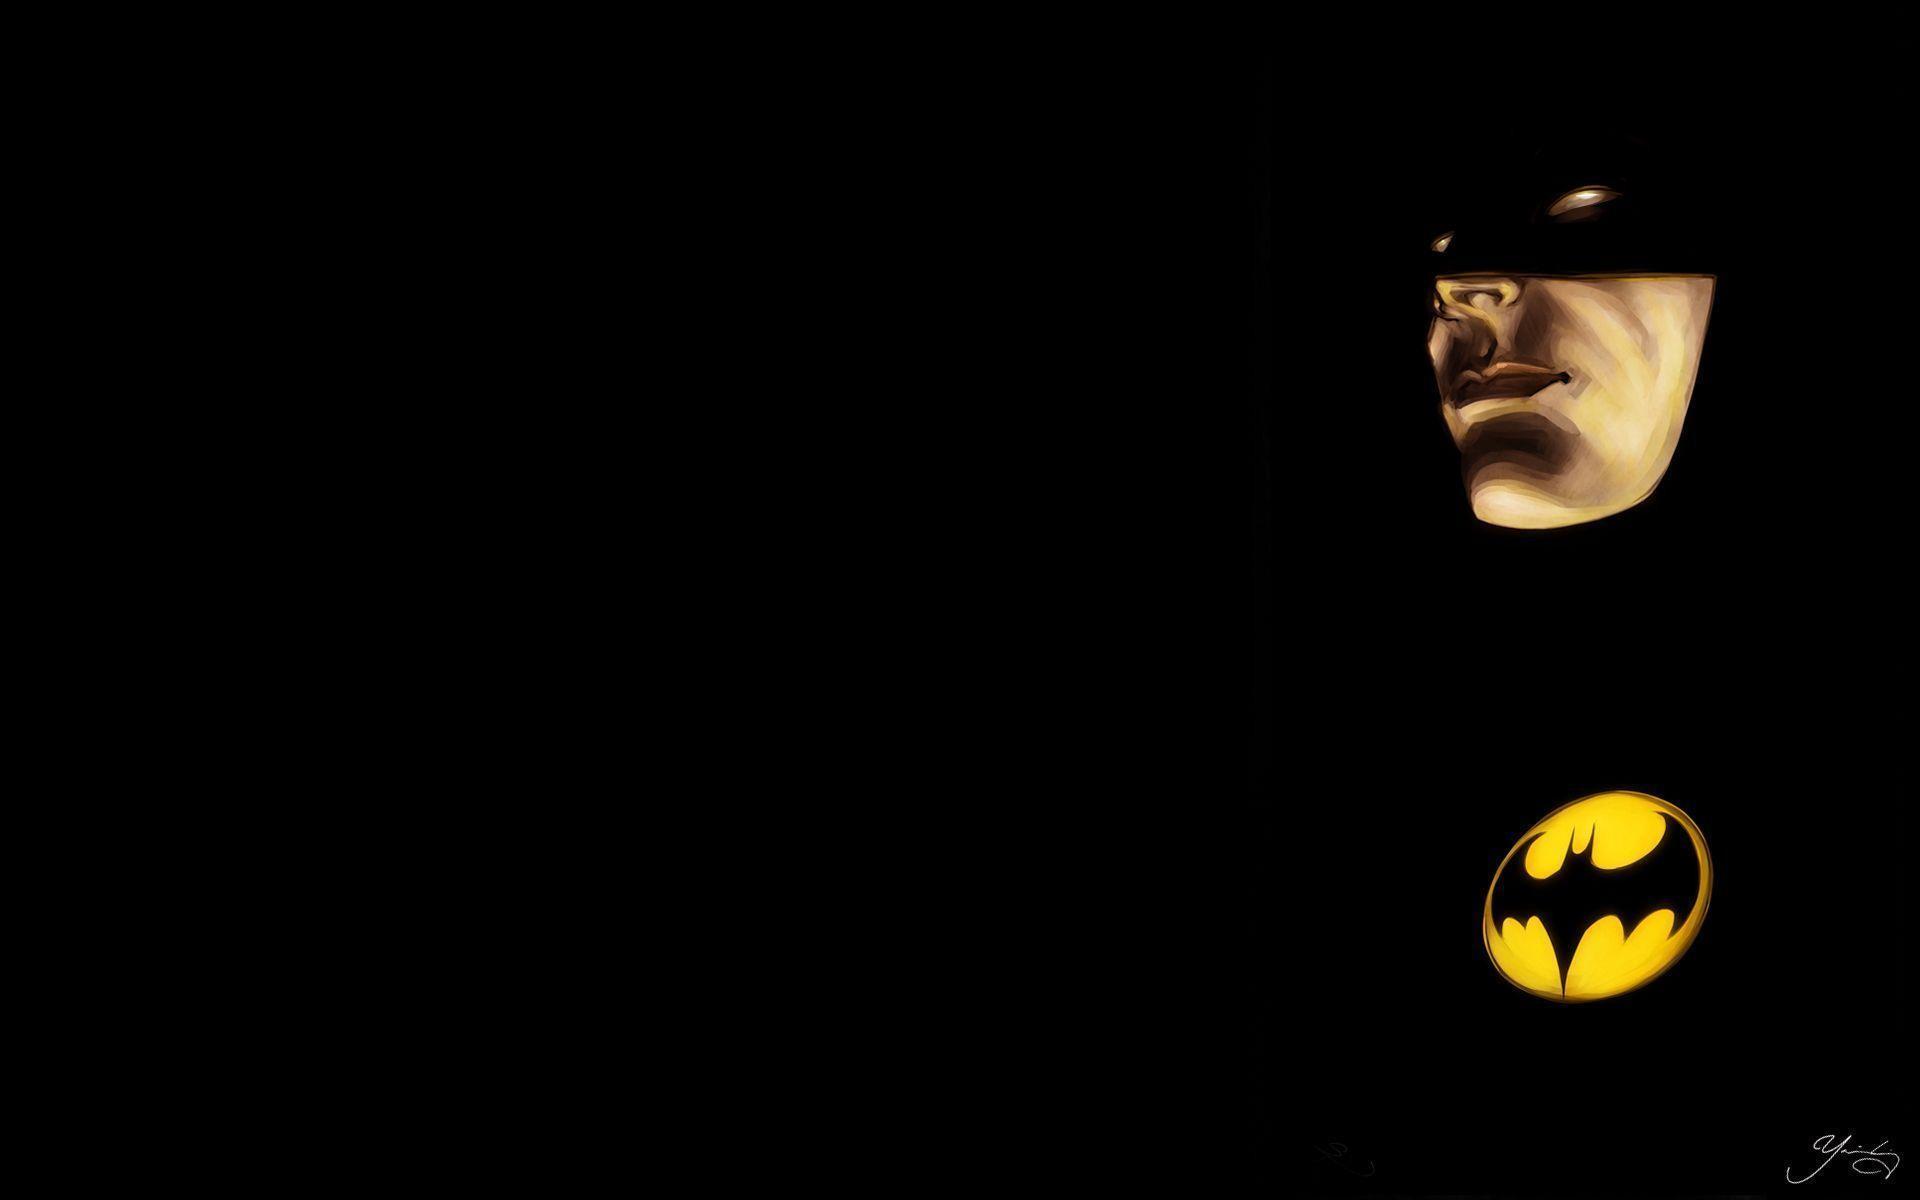 Wallpapers For > Batman Logo Wallpaper